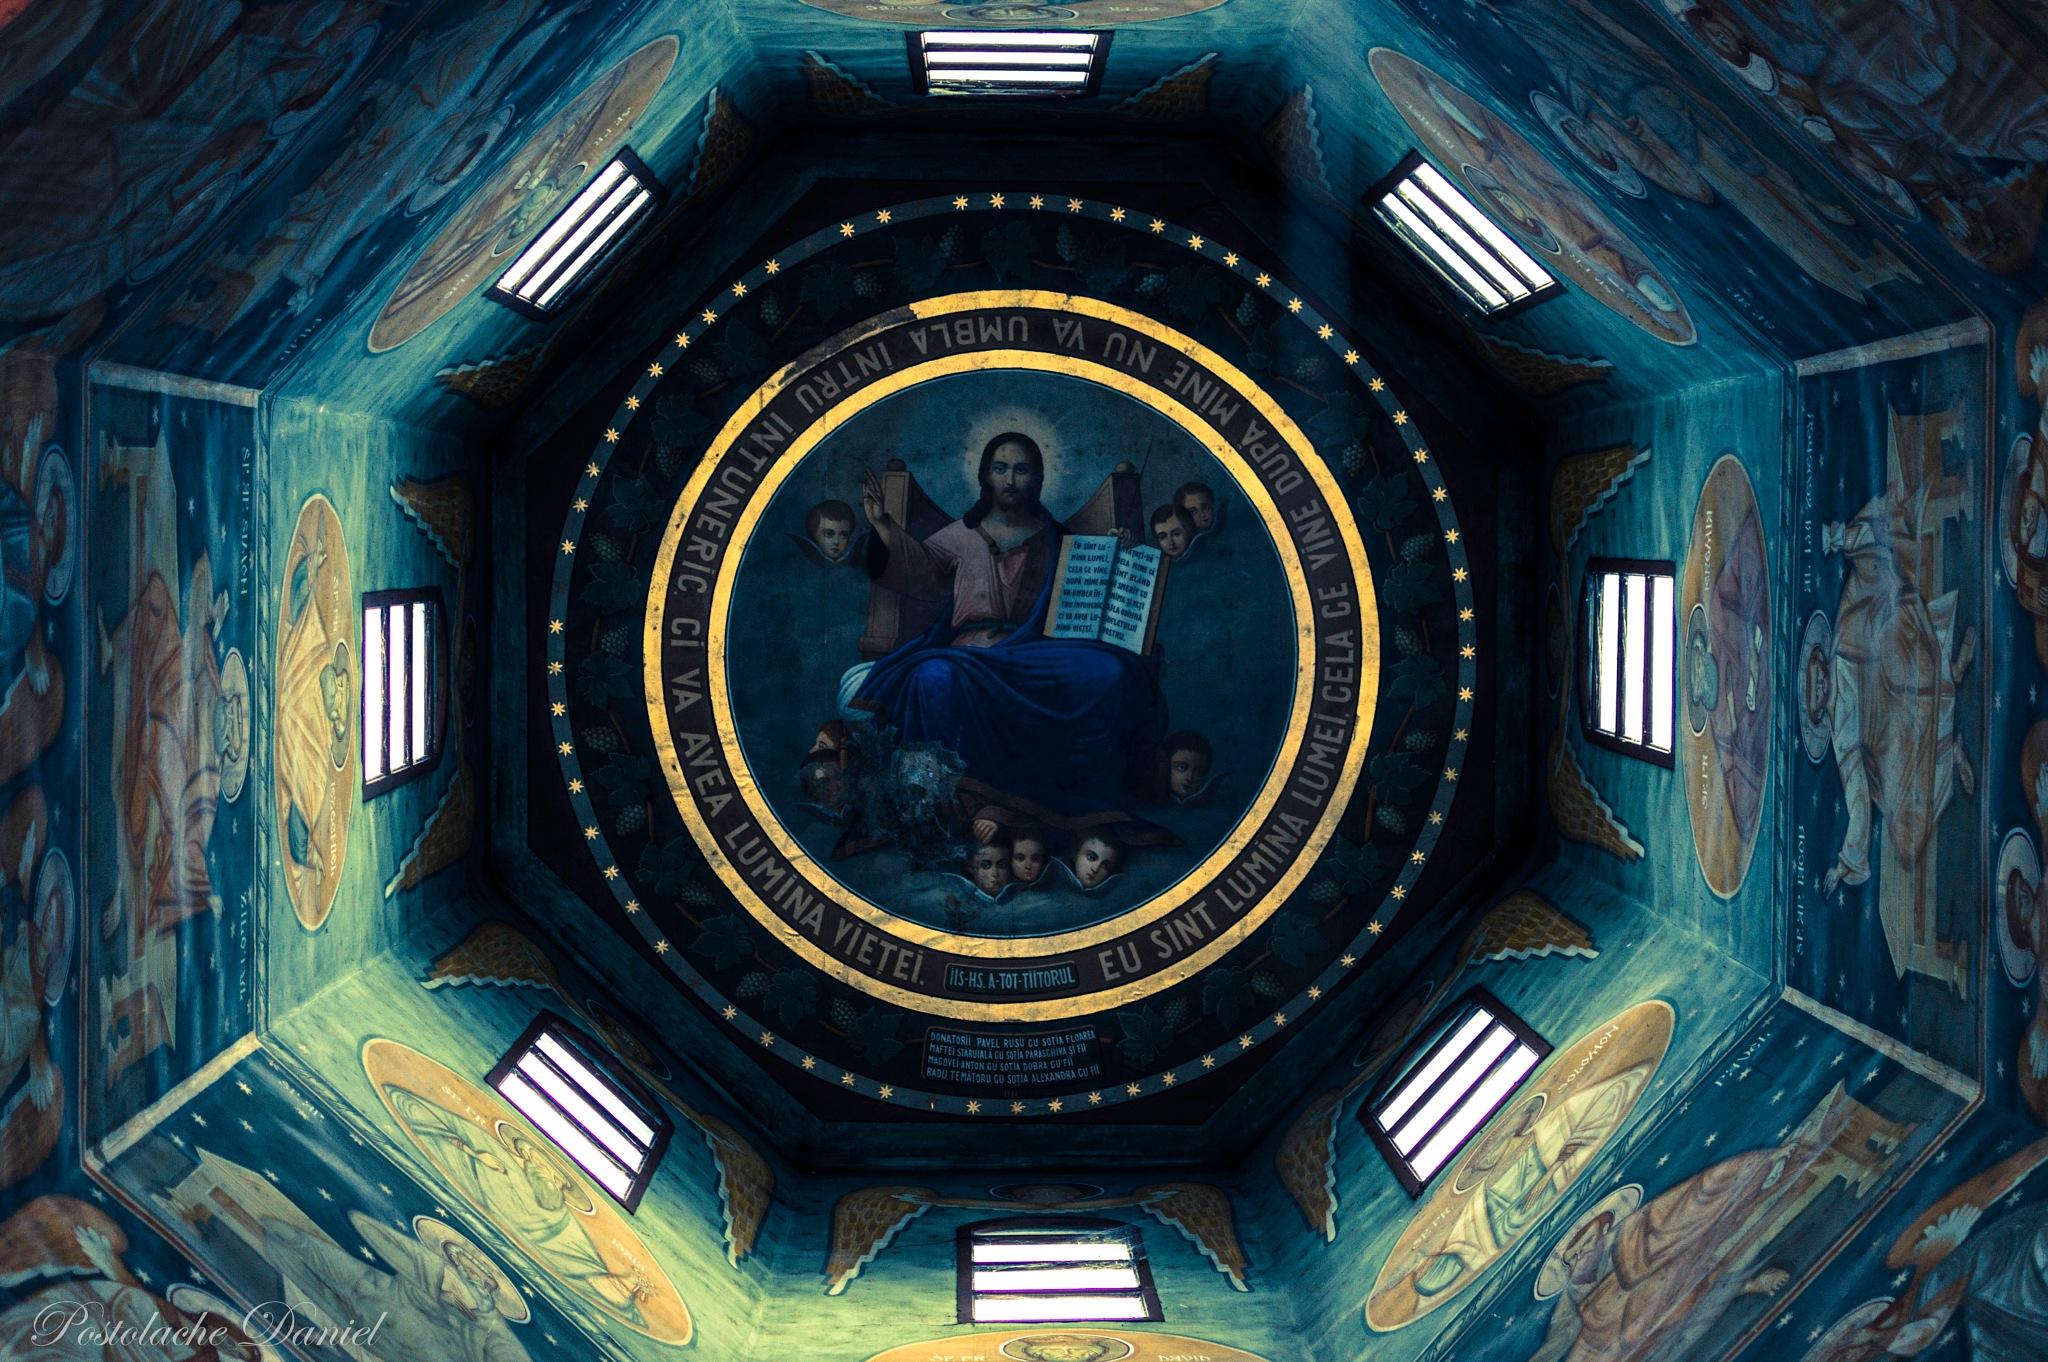 Church tower simetry by Postolache Daniel